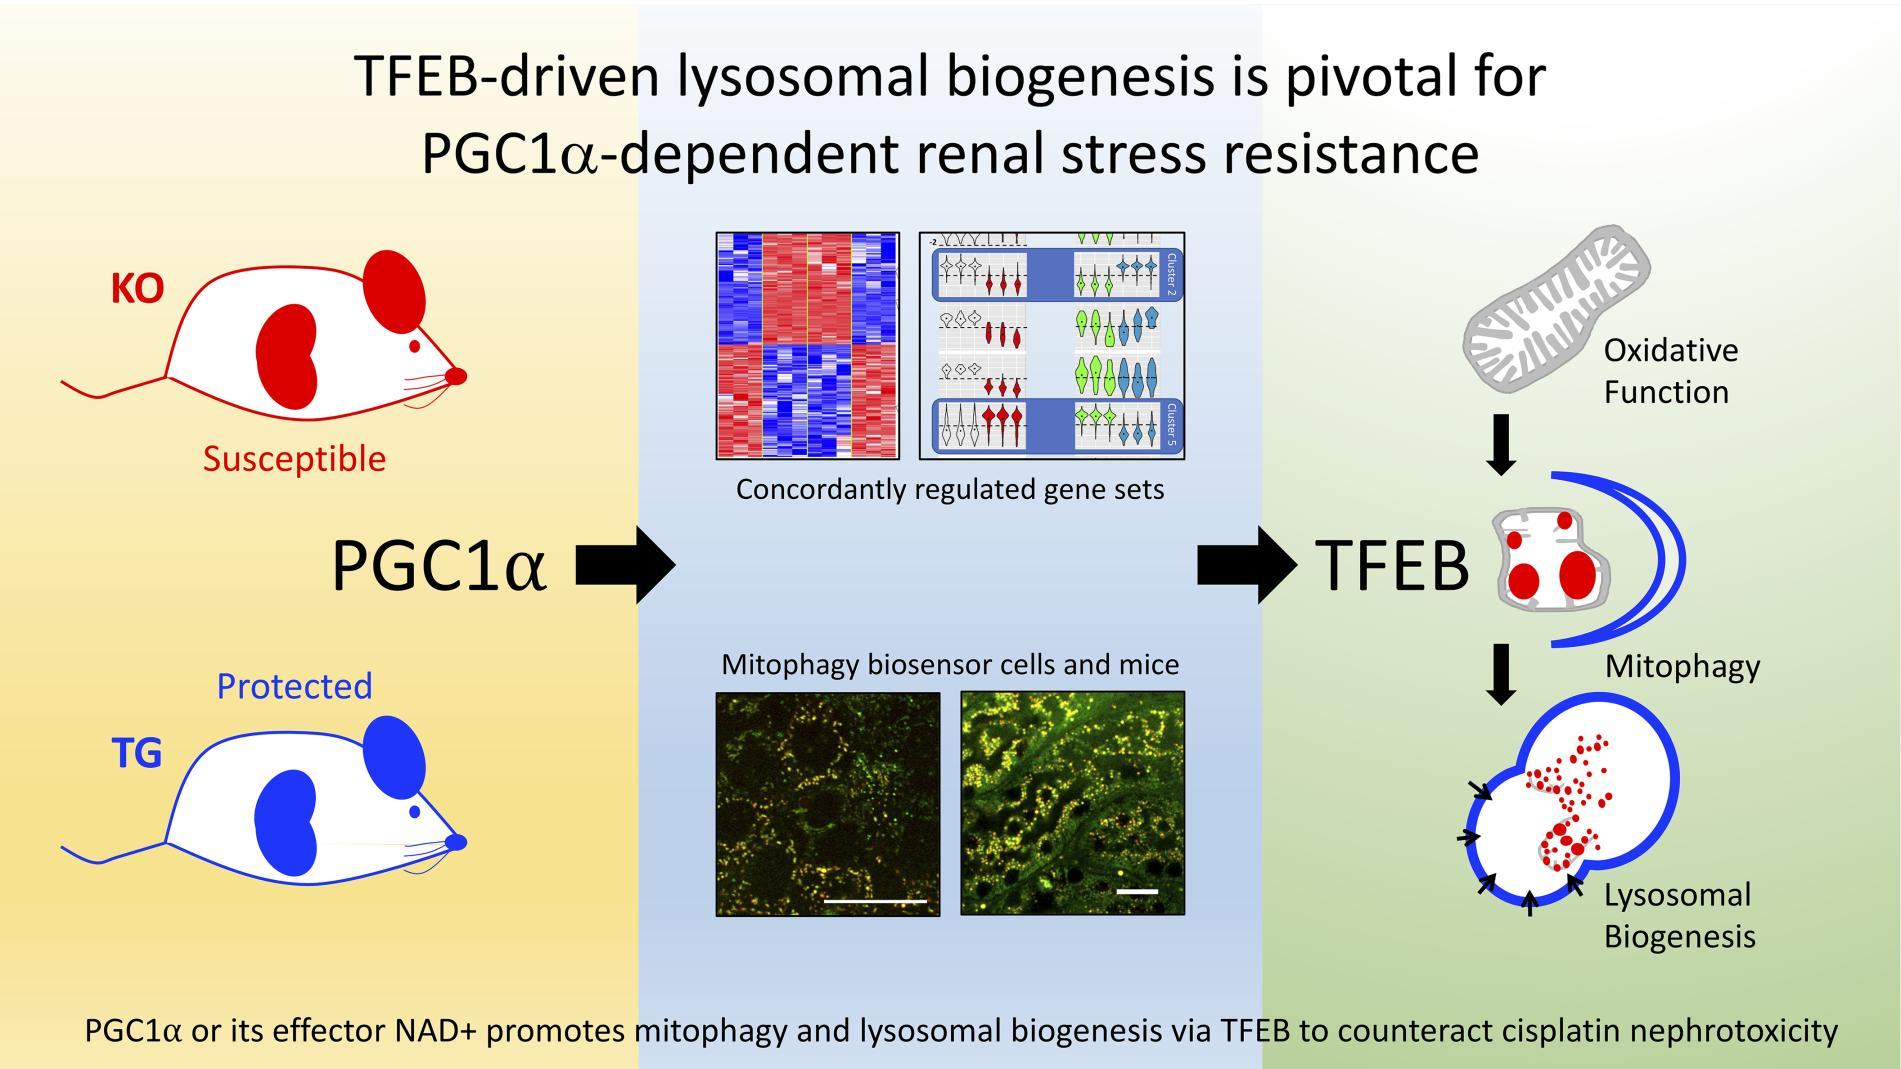 JCI Insight - TFEB-driven lysosomal biogenesis is pivotal